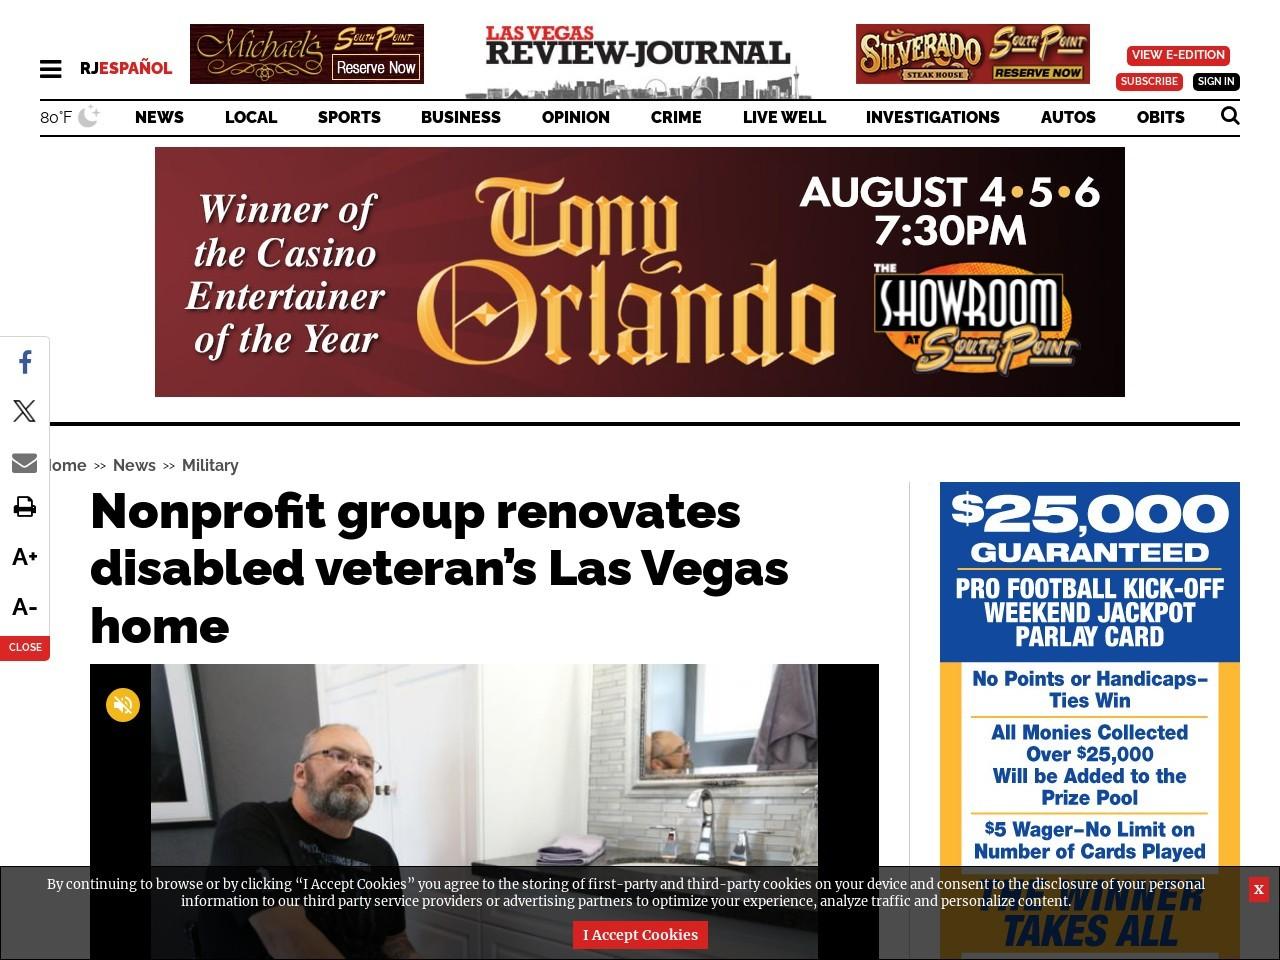 Nonprofit group renovates disabled veteran's Las Vegas home